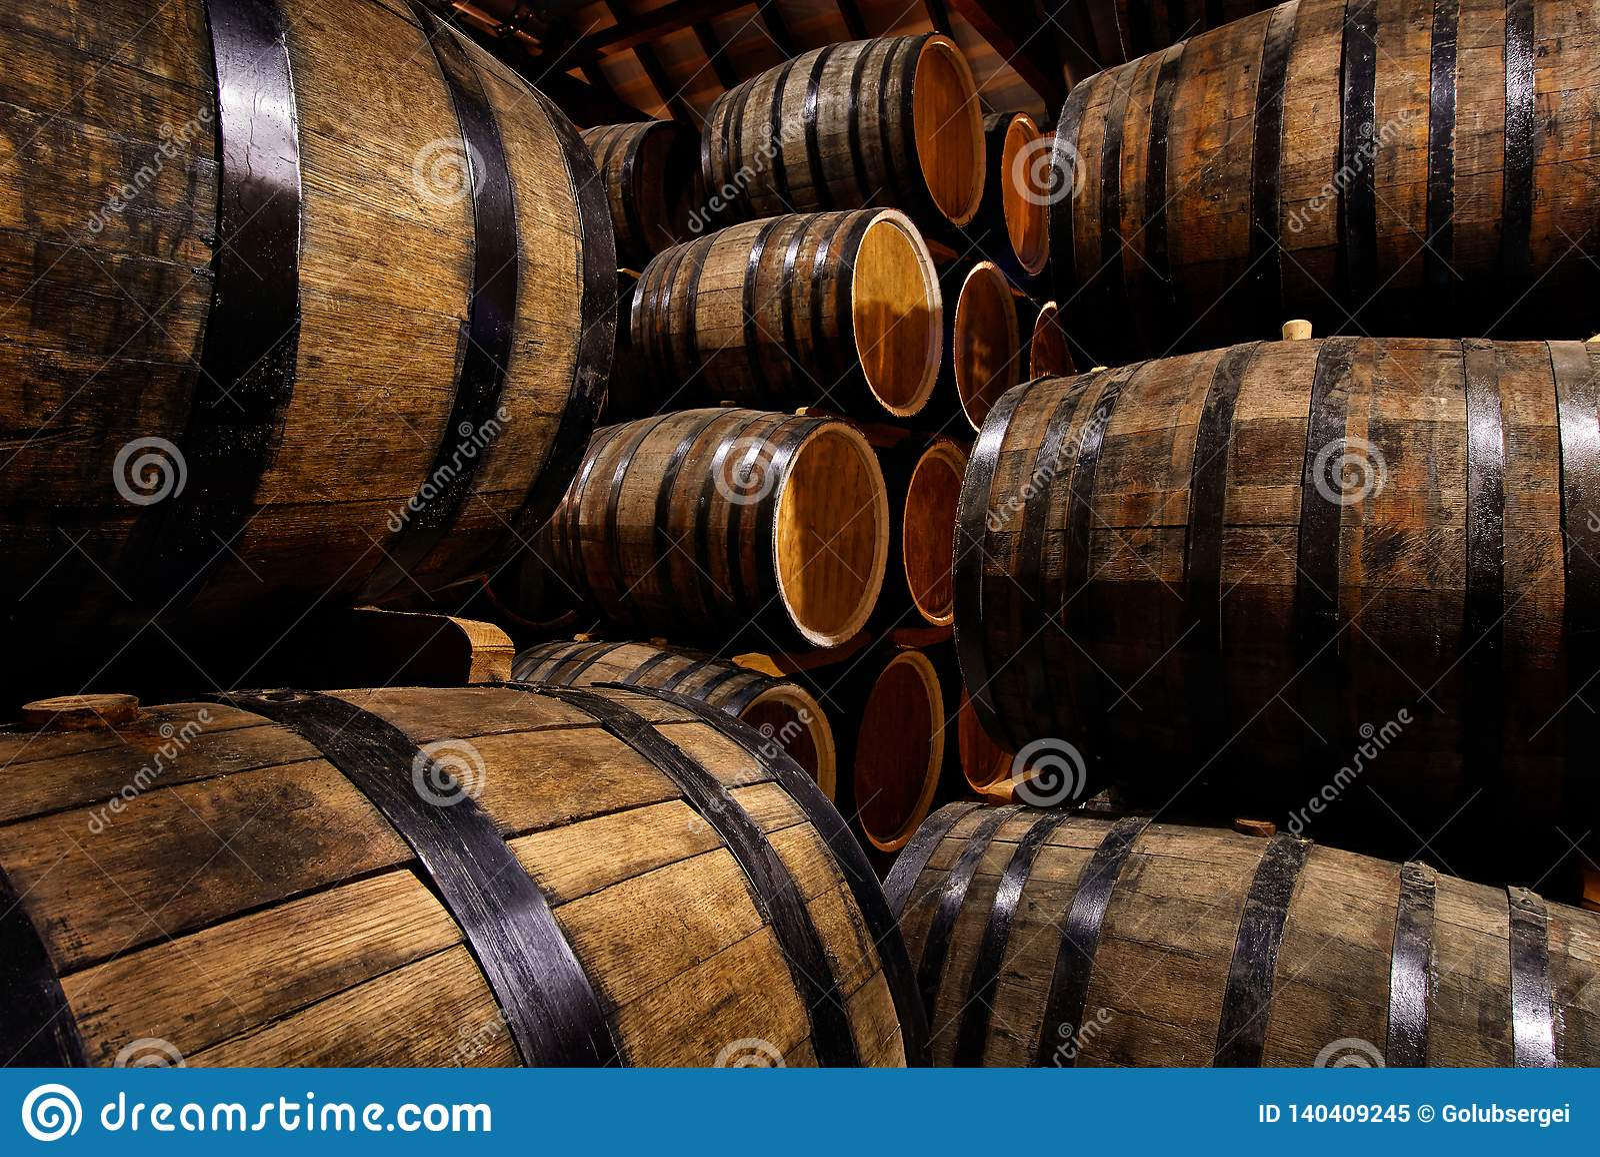 Fileiras de cilindros alcoólicos no estoque distillery Conhaque, uísque, vinho, aguardente Álcool nos tambores